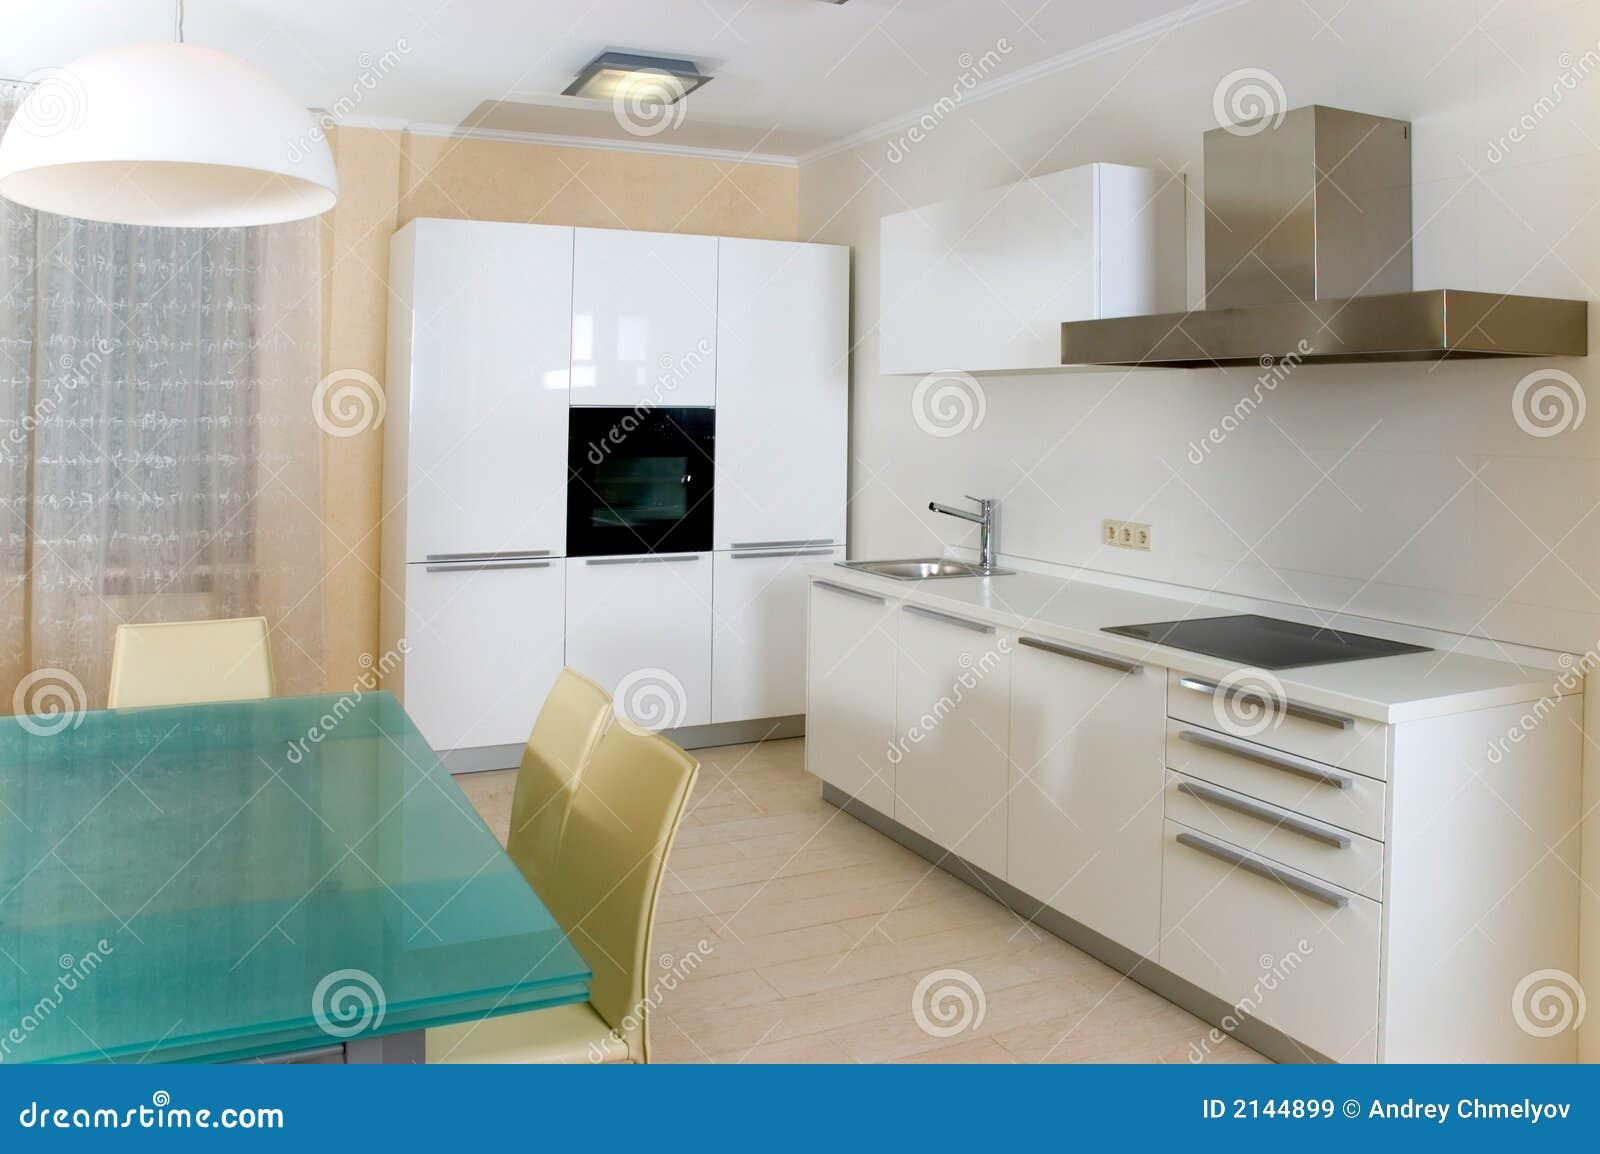 Moderne keuken met meubilair stock afbeelding afbeelding 2144899 - Center meubilair keuken ...